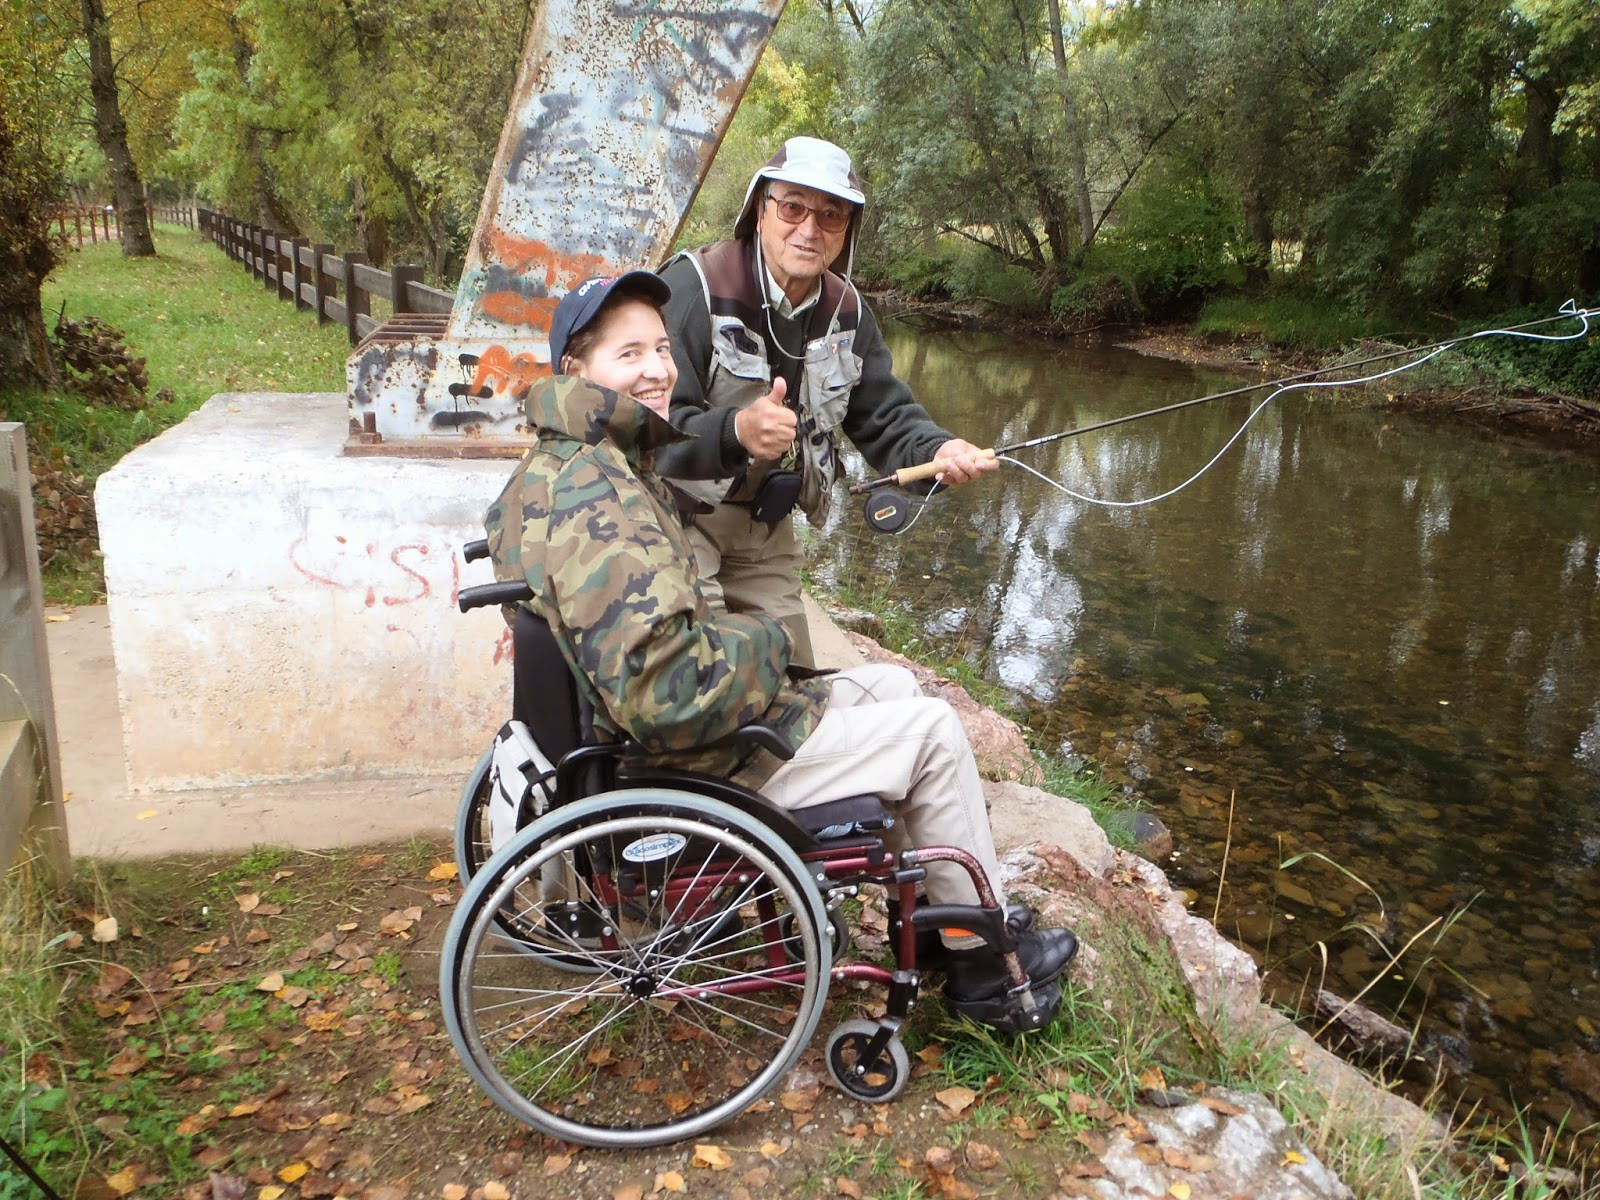 La pesca en pareja.